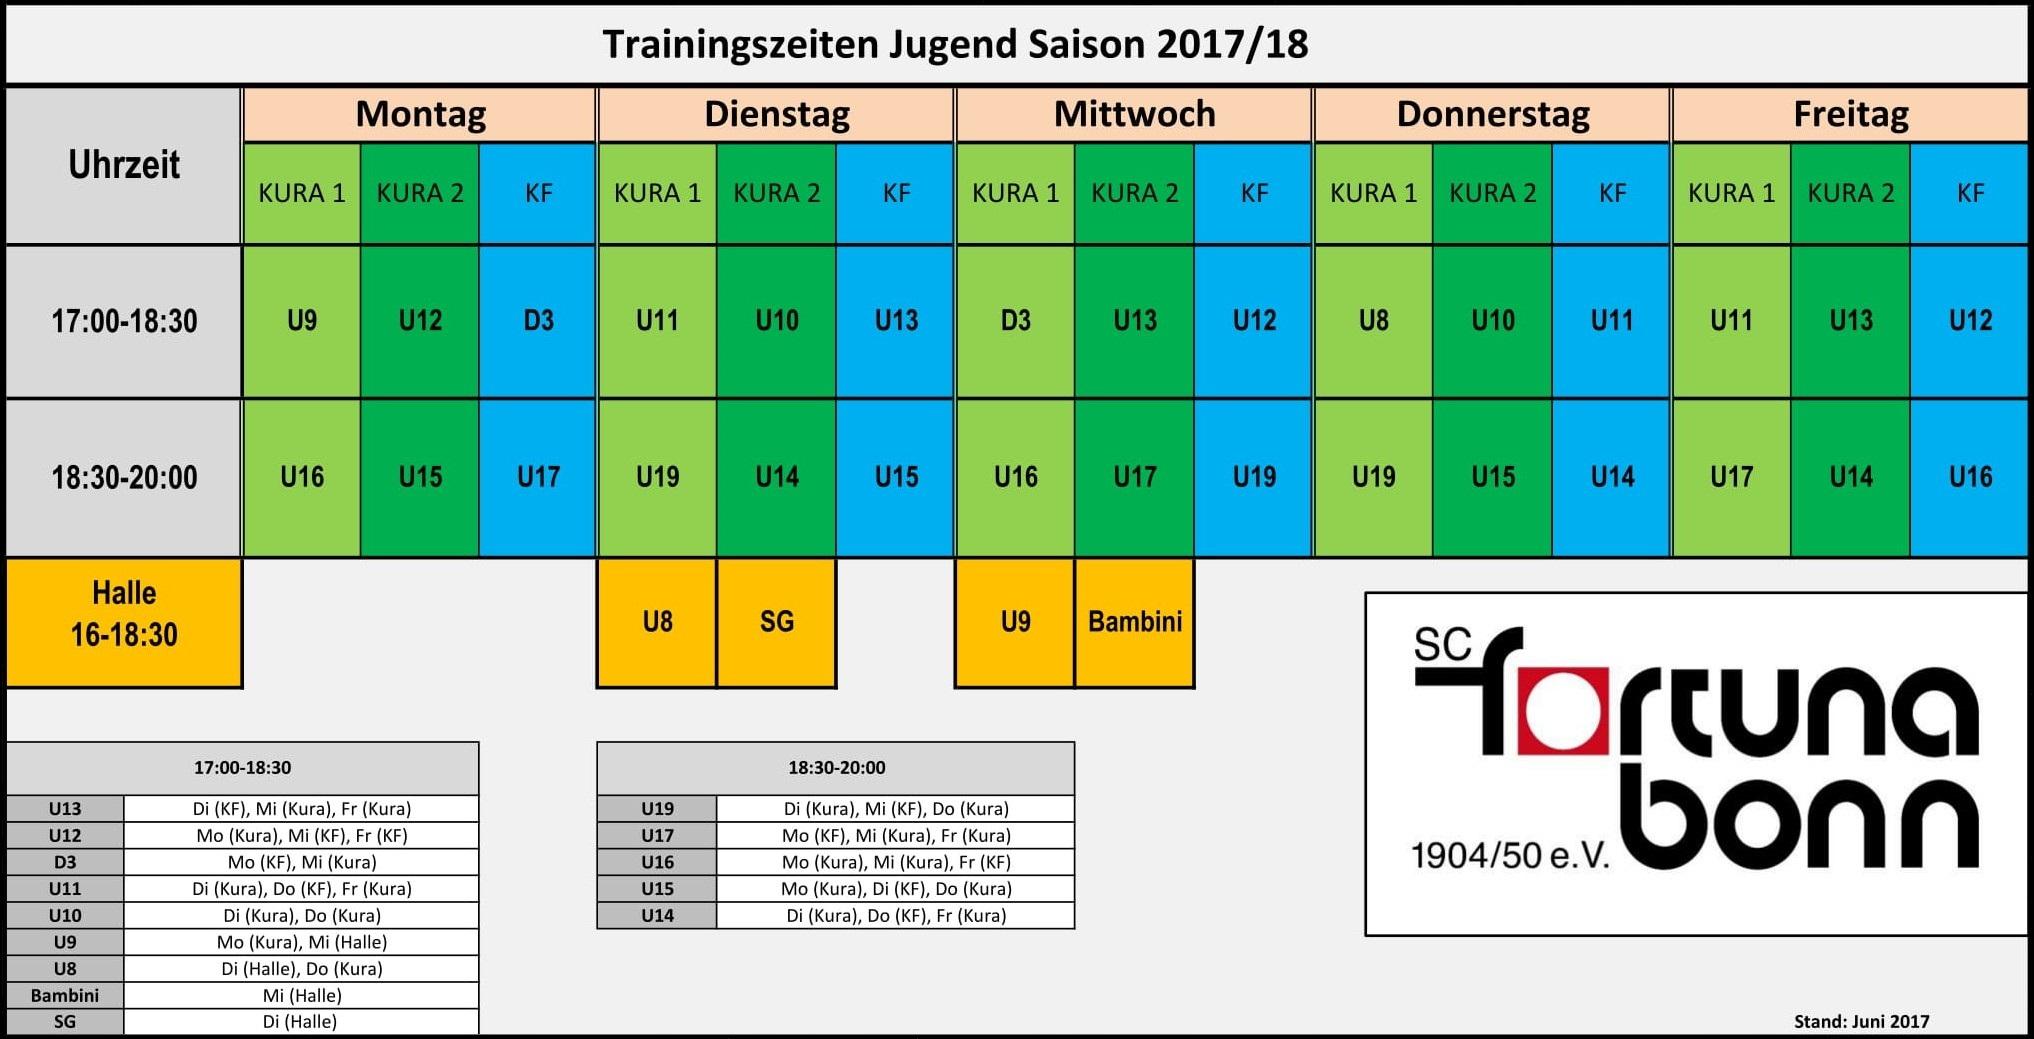 Trainingszeiten_2017_18-1